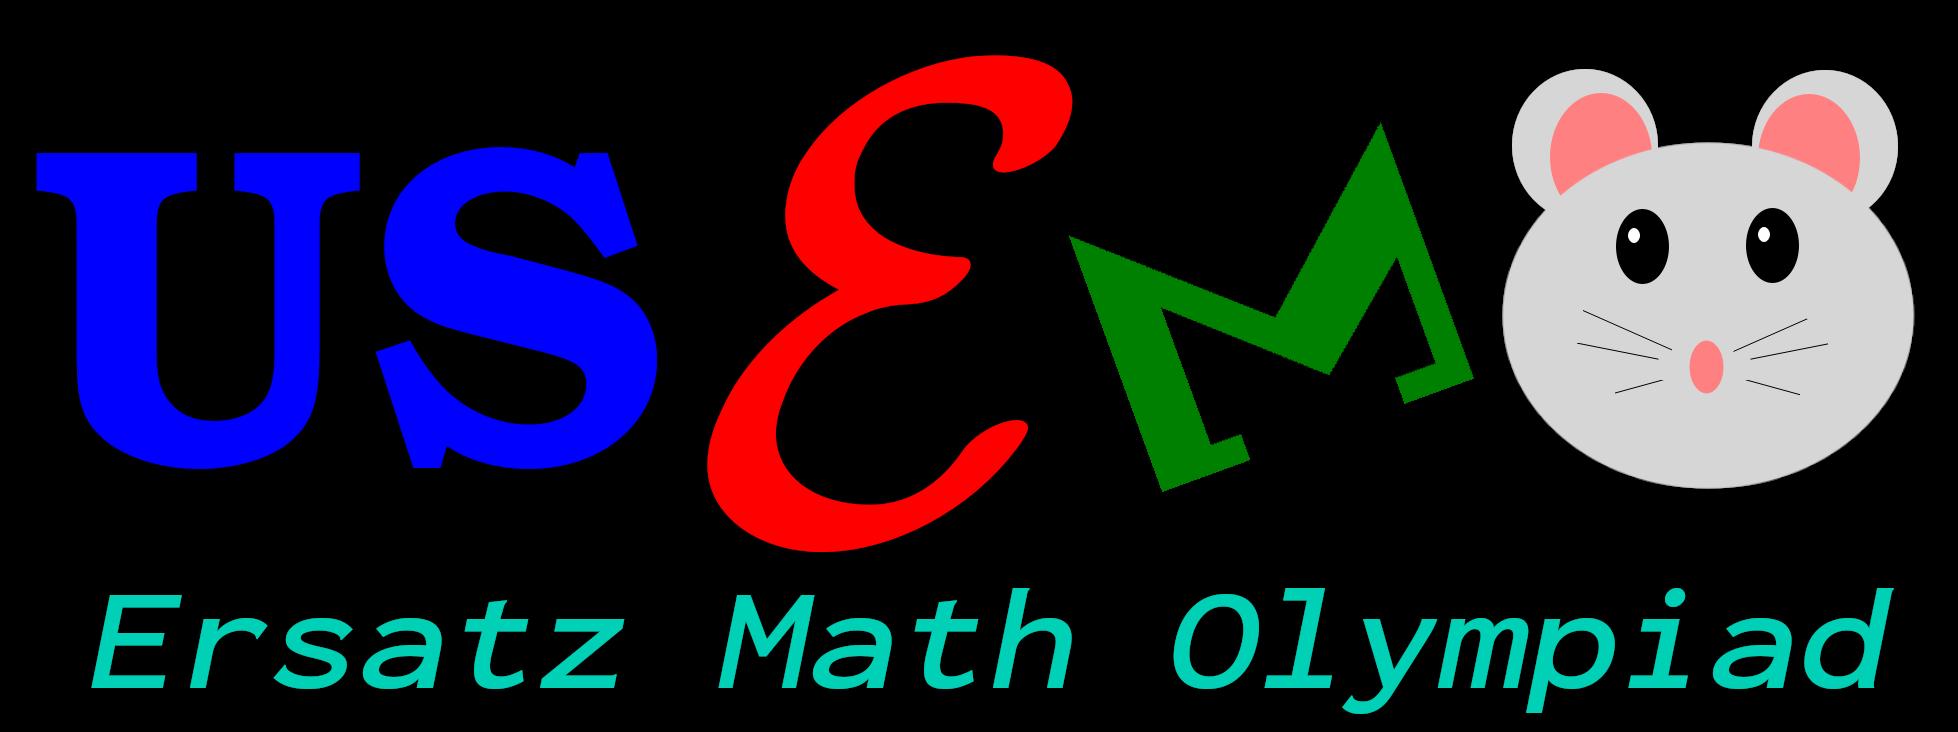 https://web.evanchen.cc/static/usemo/usemo-logo.png